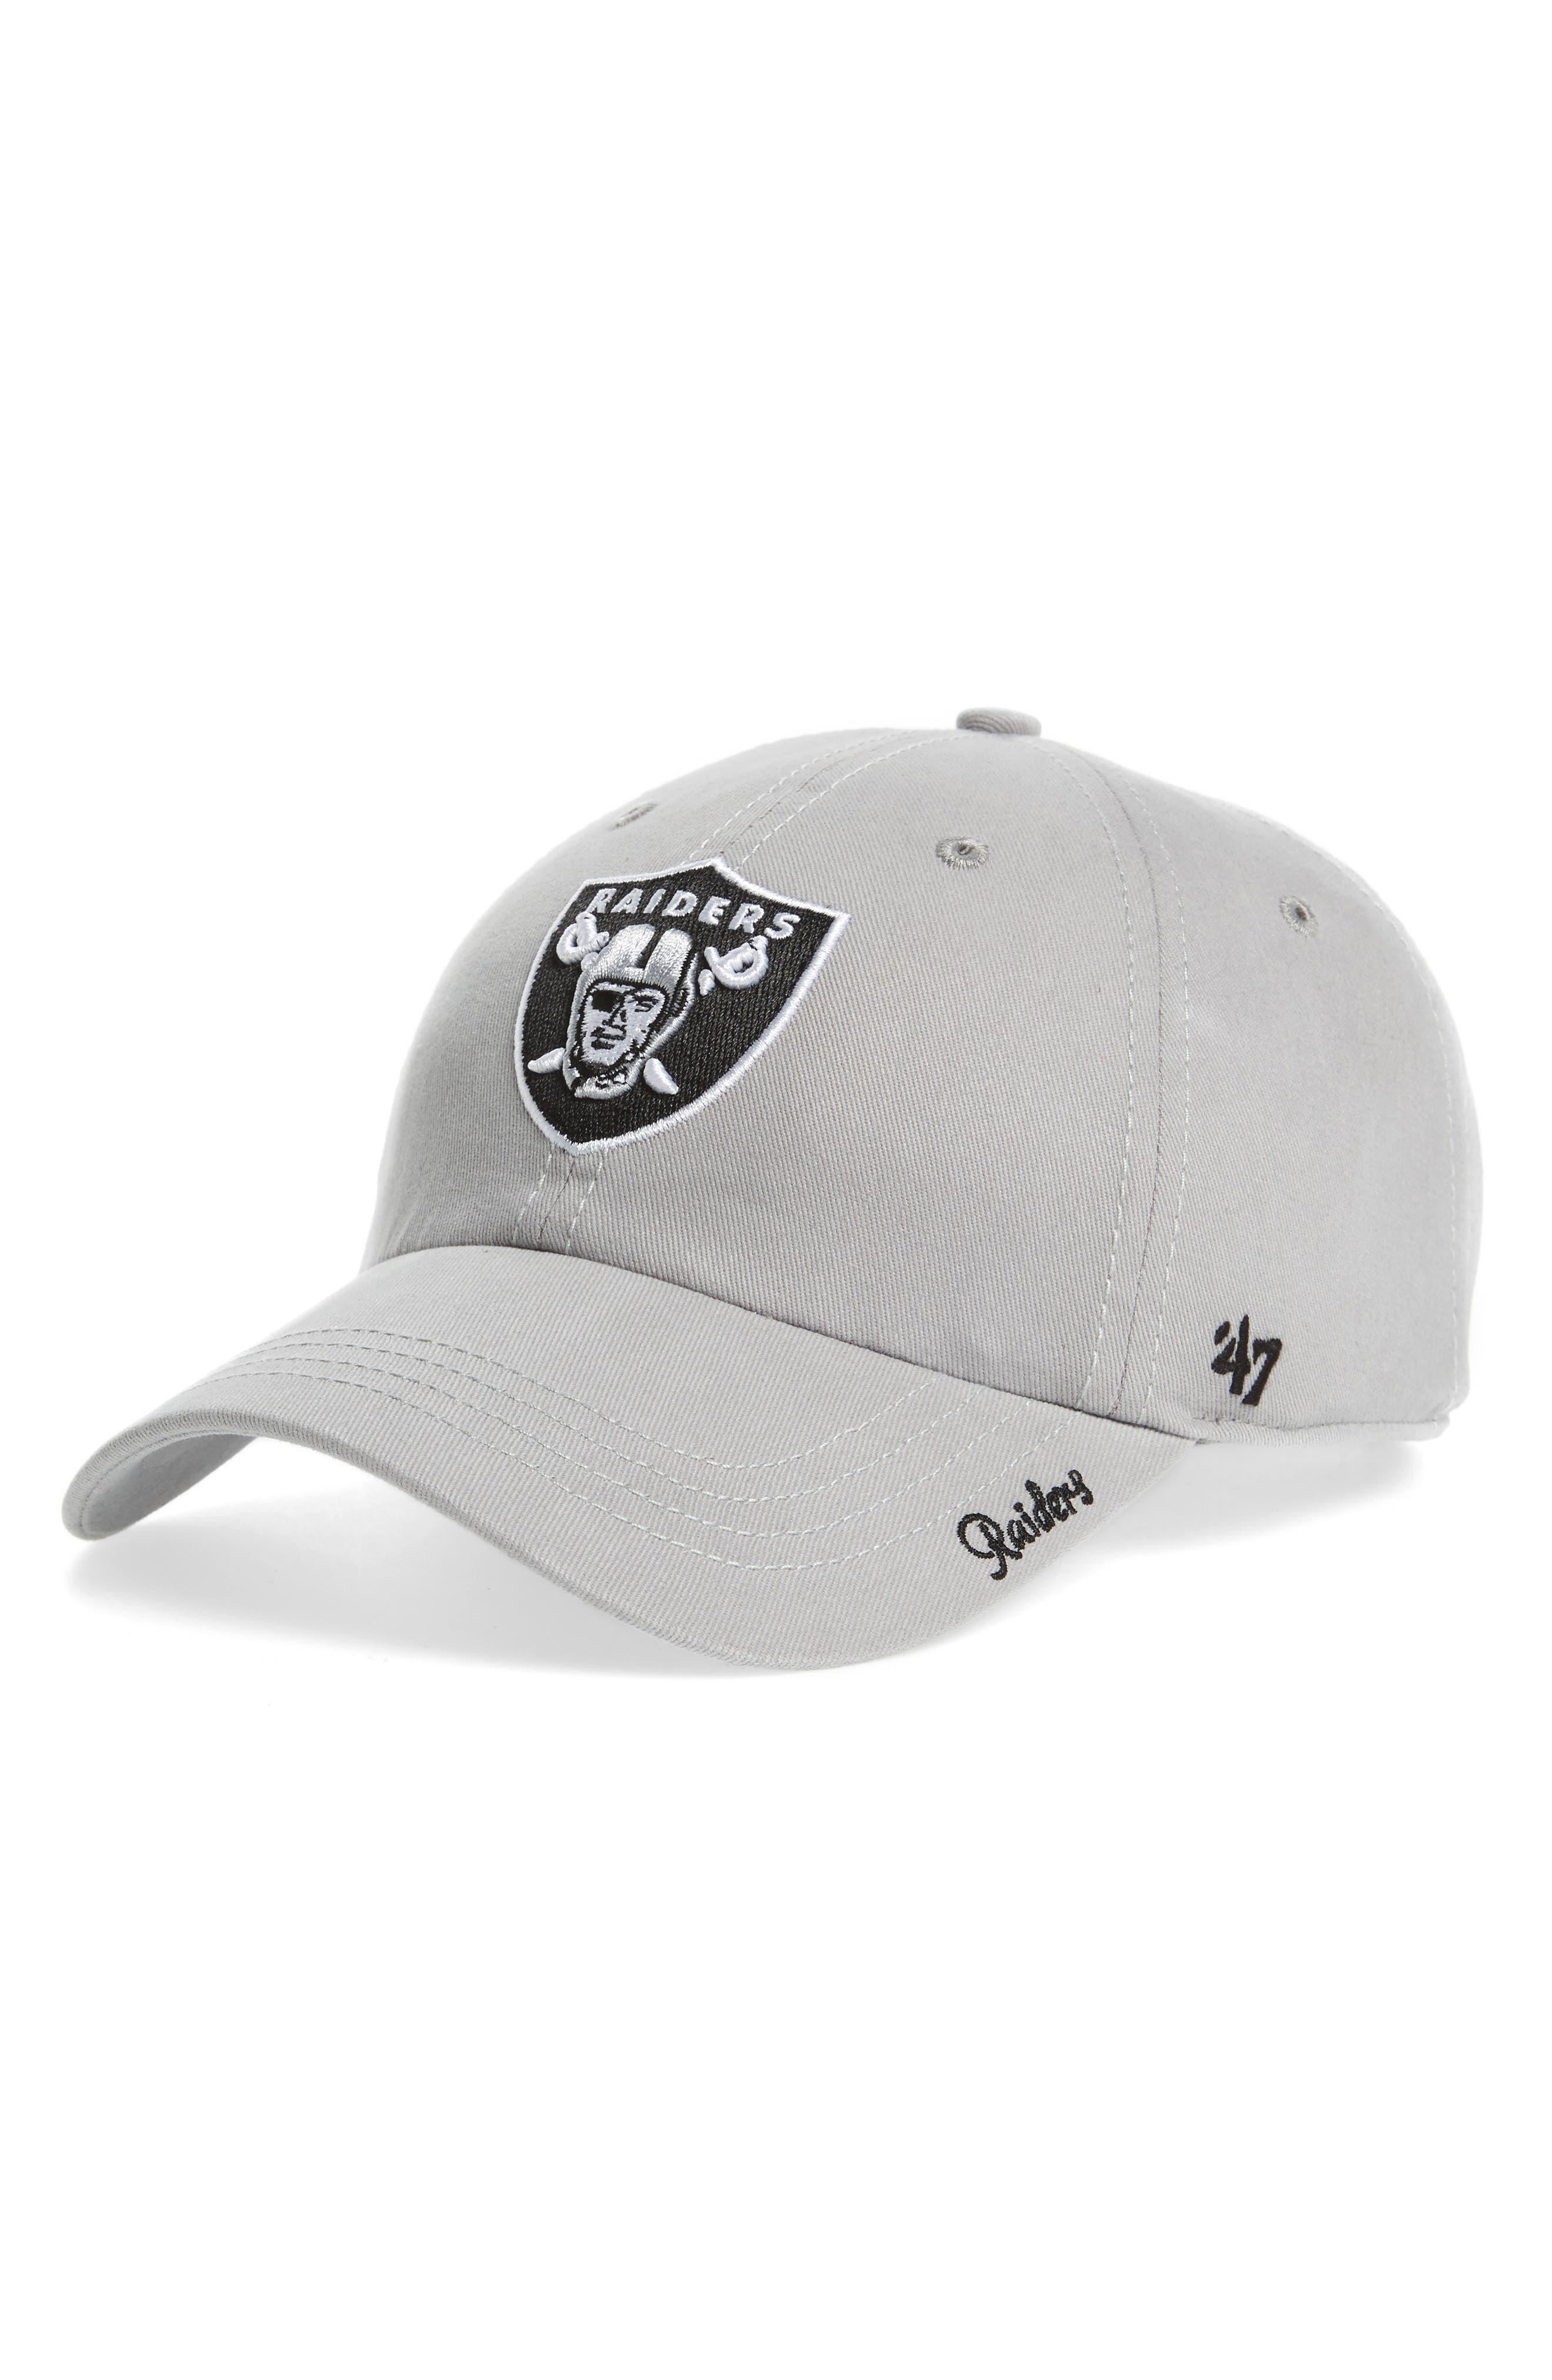 Miata Oakland Raiders Baseball Cap,                         Main,                         color, Dark Grey